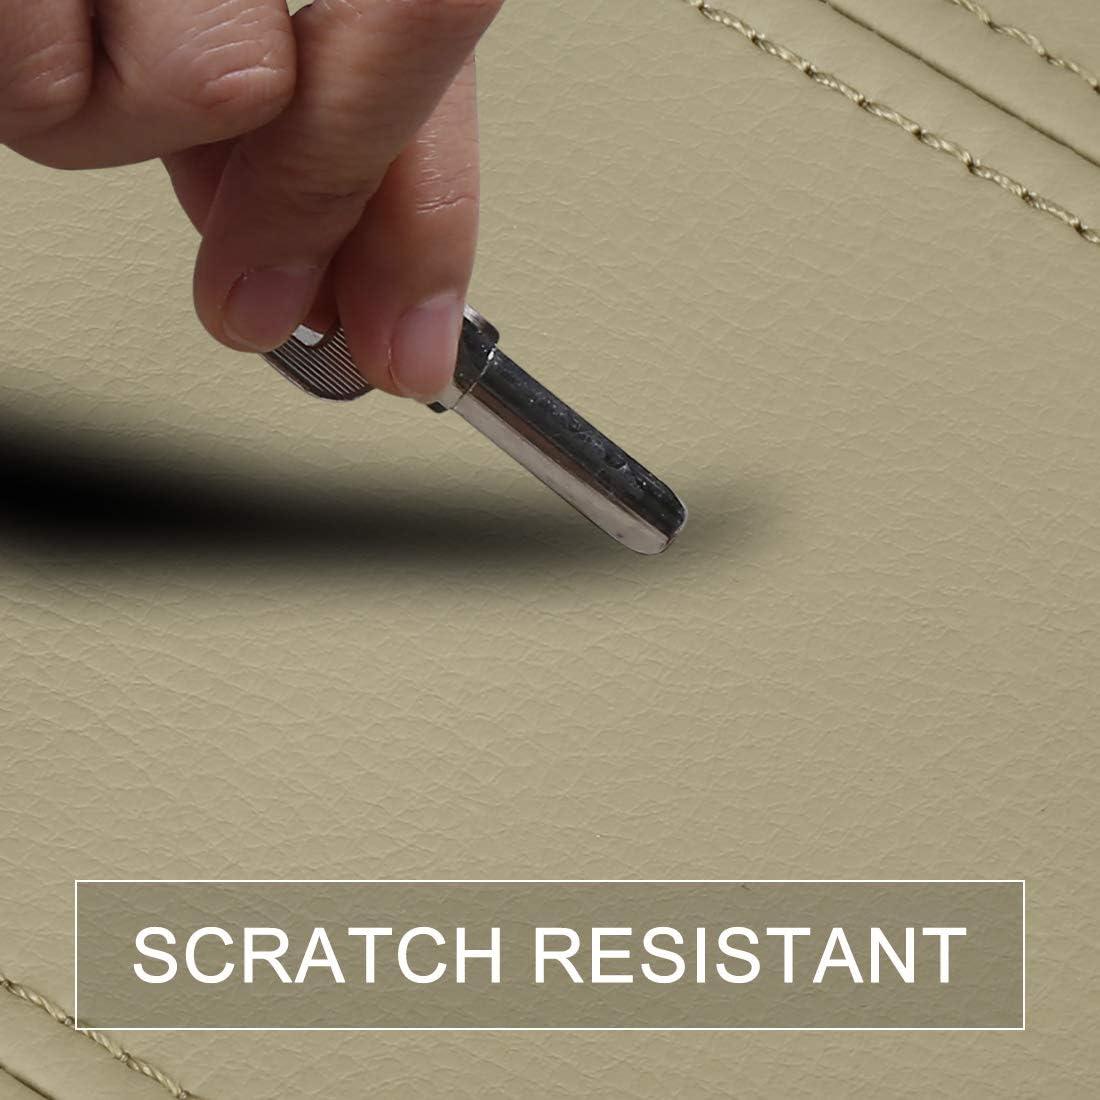 X AUTOHAUX Center Console Cover Armrest Cover Pad Replacement Microfiber Leather Beige 43.5x18cm